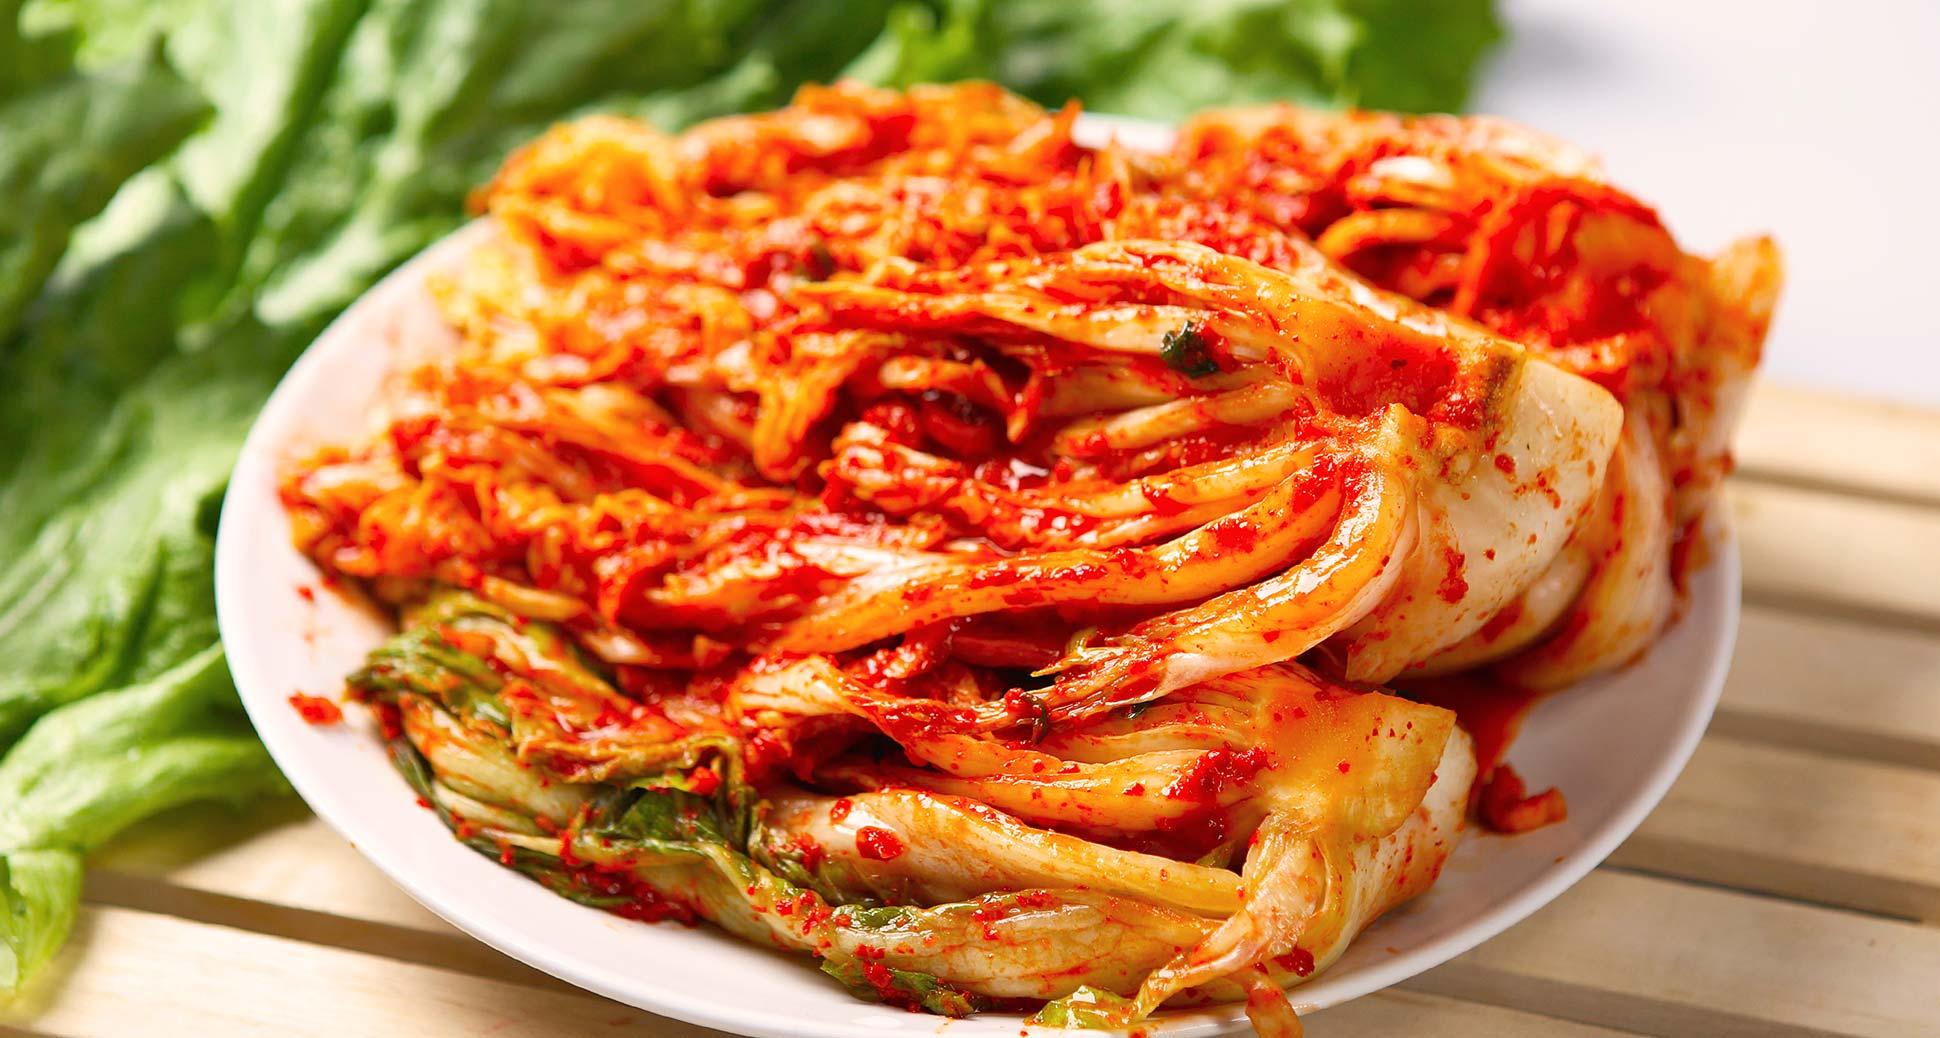 healthy lifestyle in Korea